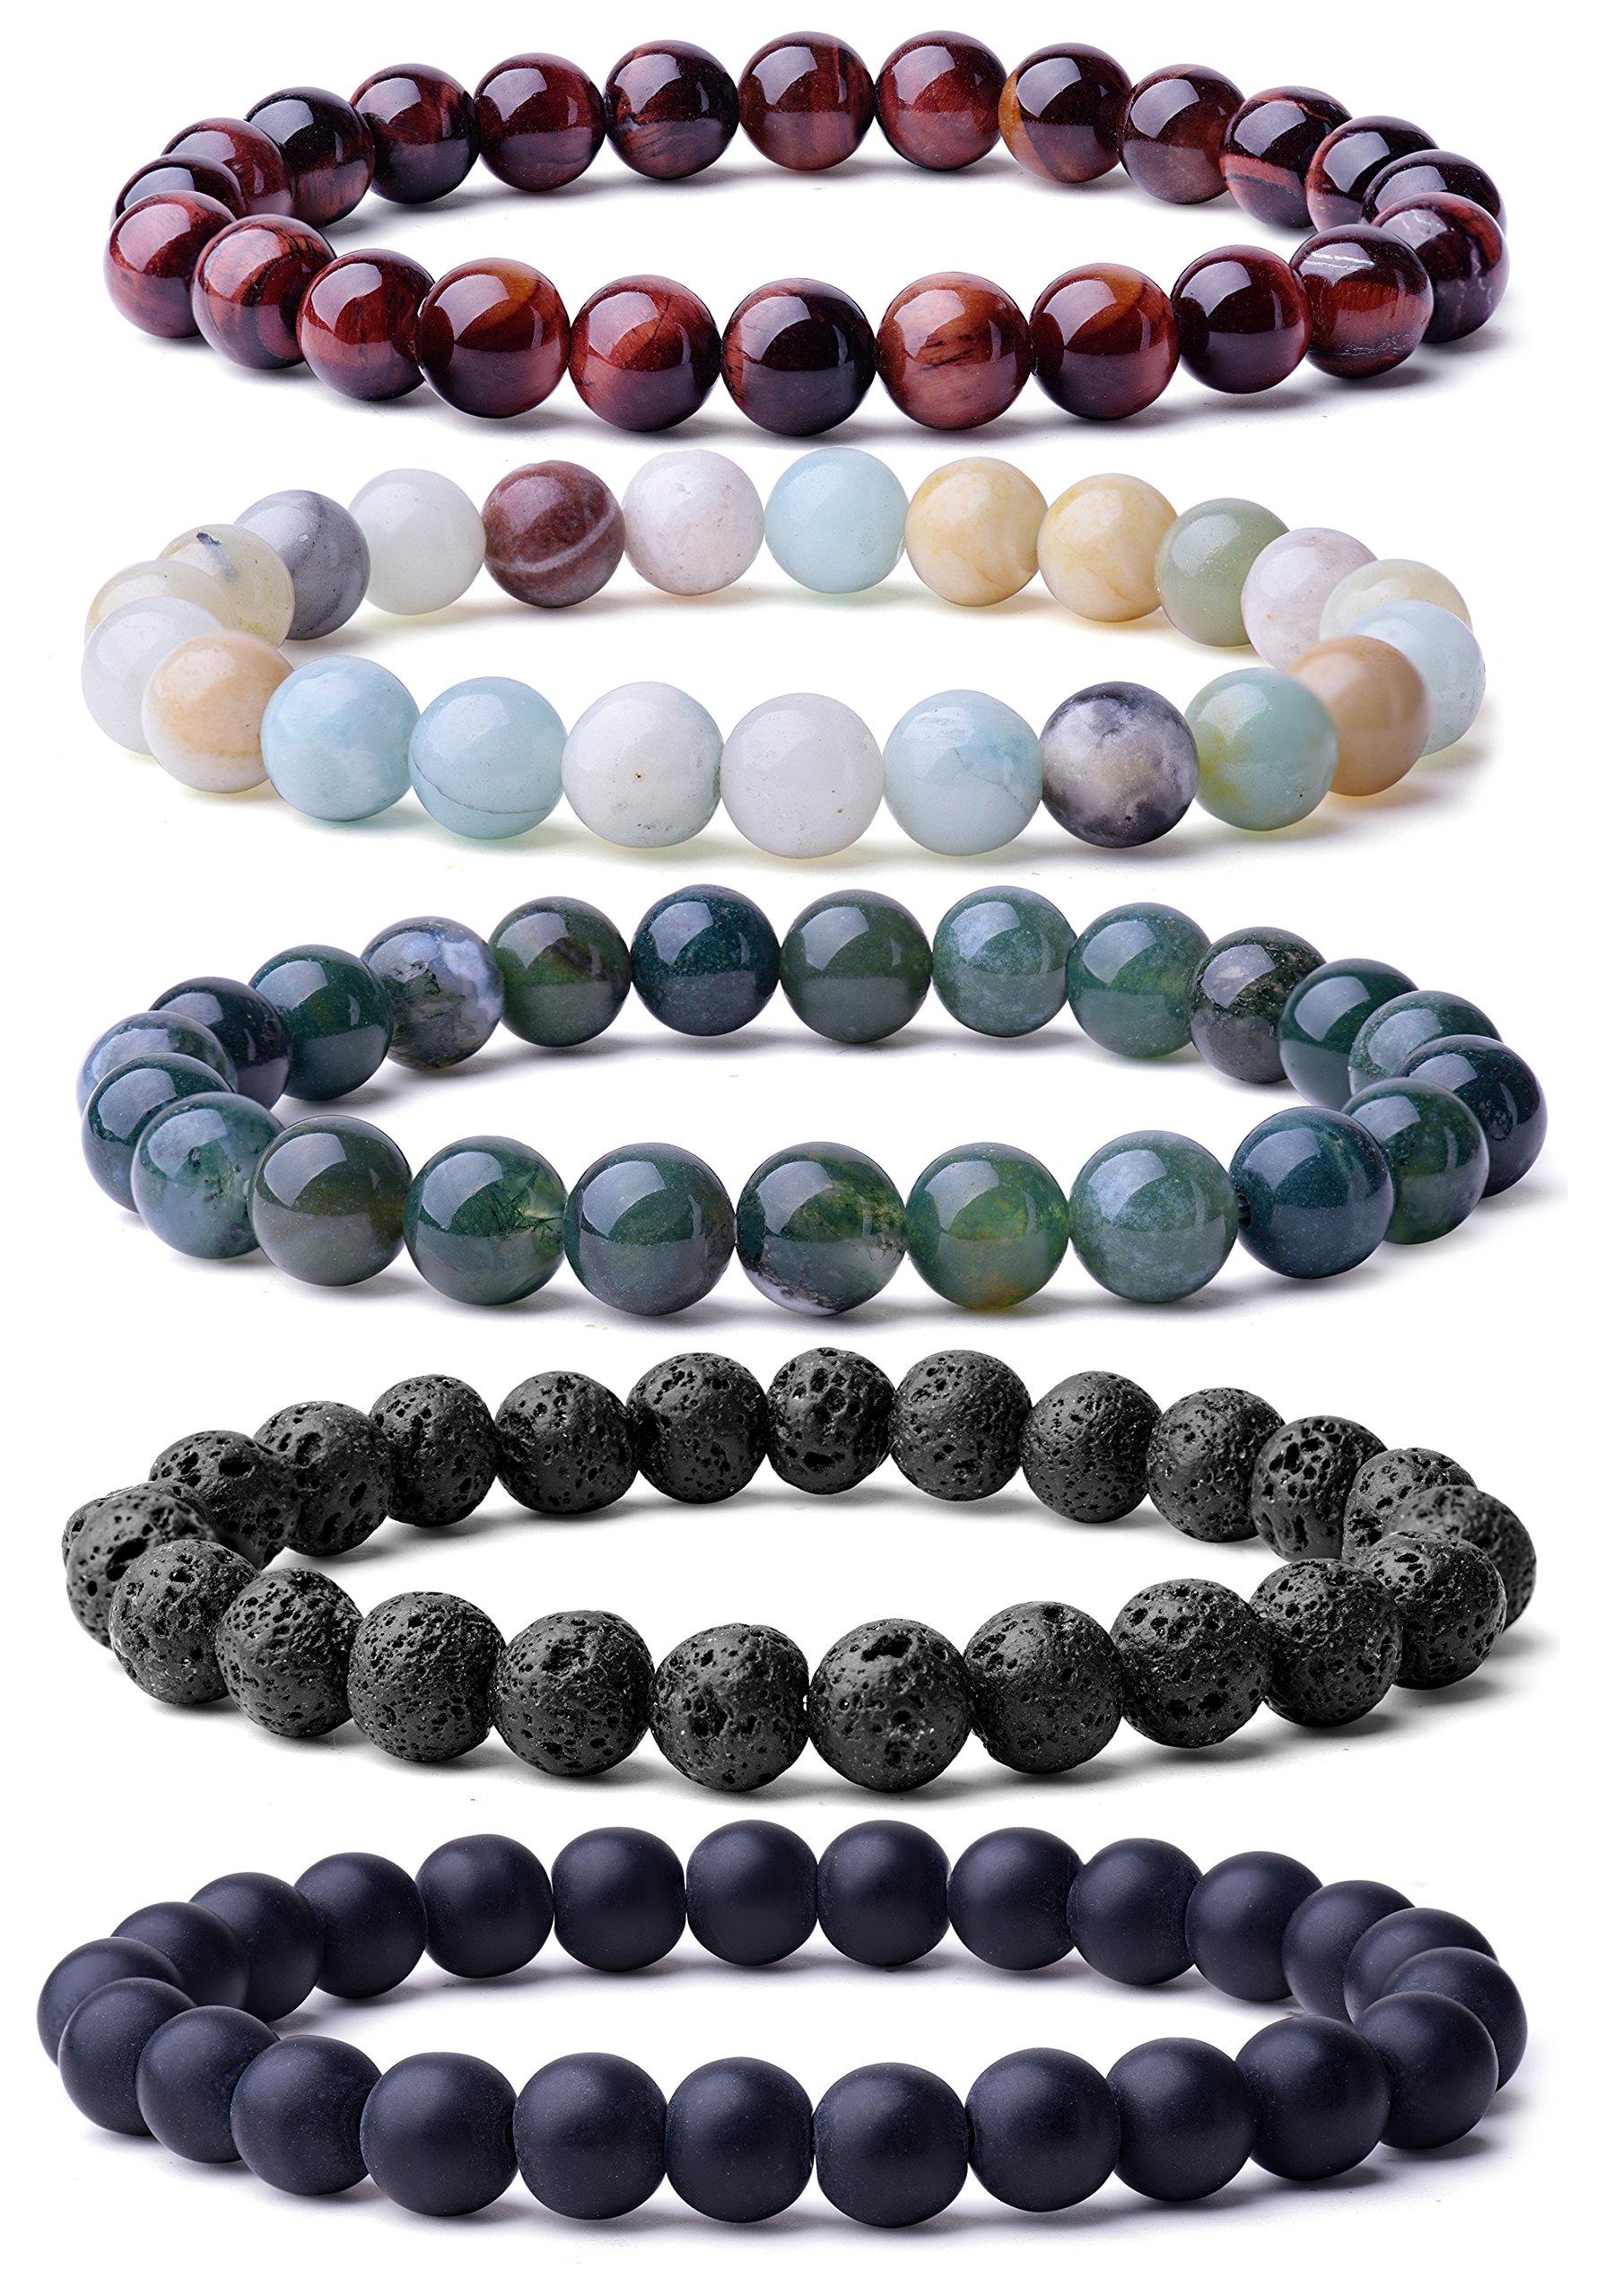 WRCXSTONE Natural 8mm Gorgeous Semi-Precious Gemstones Healing Crystal Stretch Beaded Bracelet Unisex by WRCXSTONE